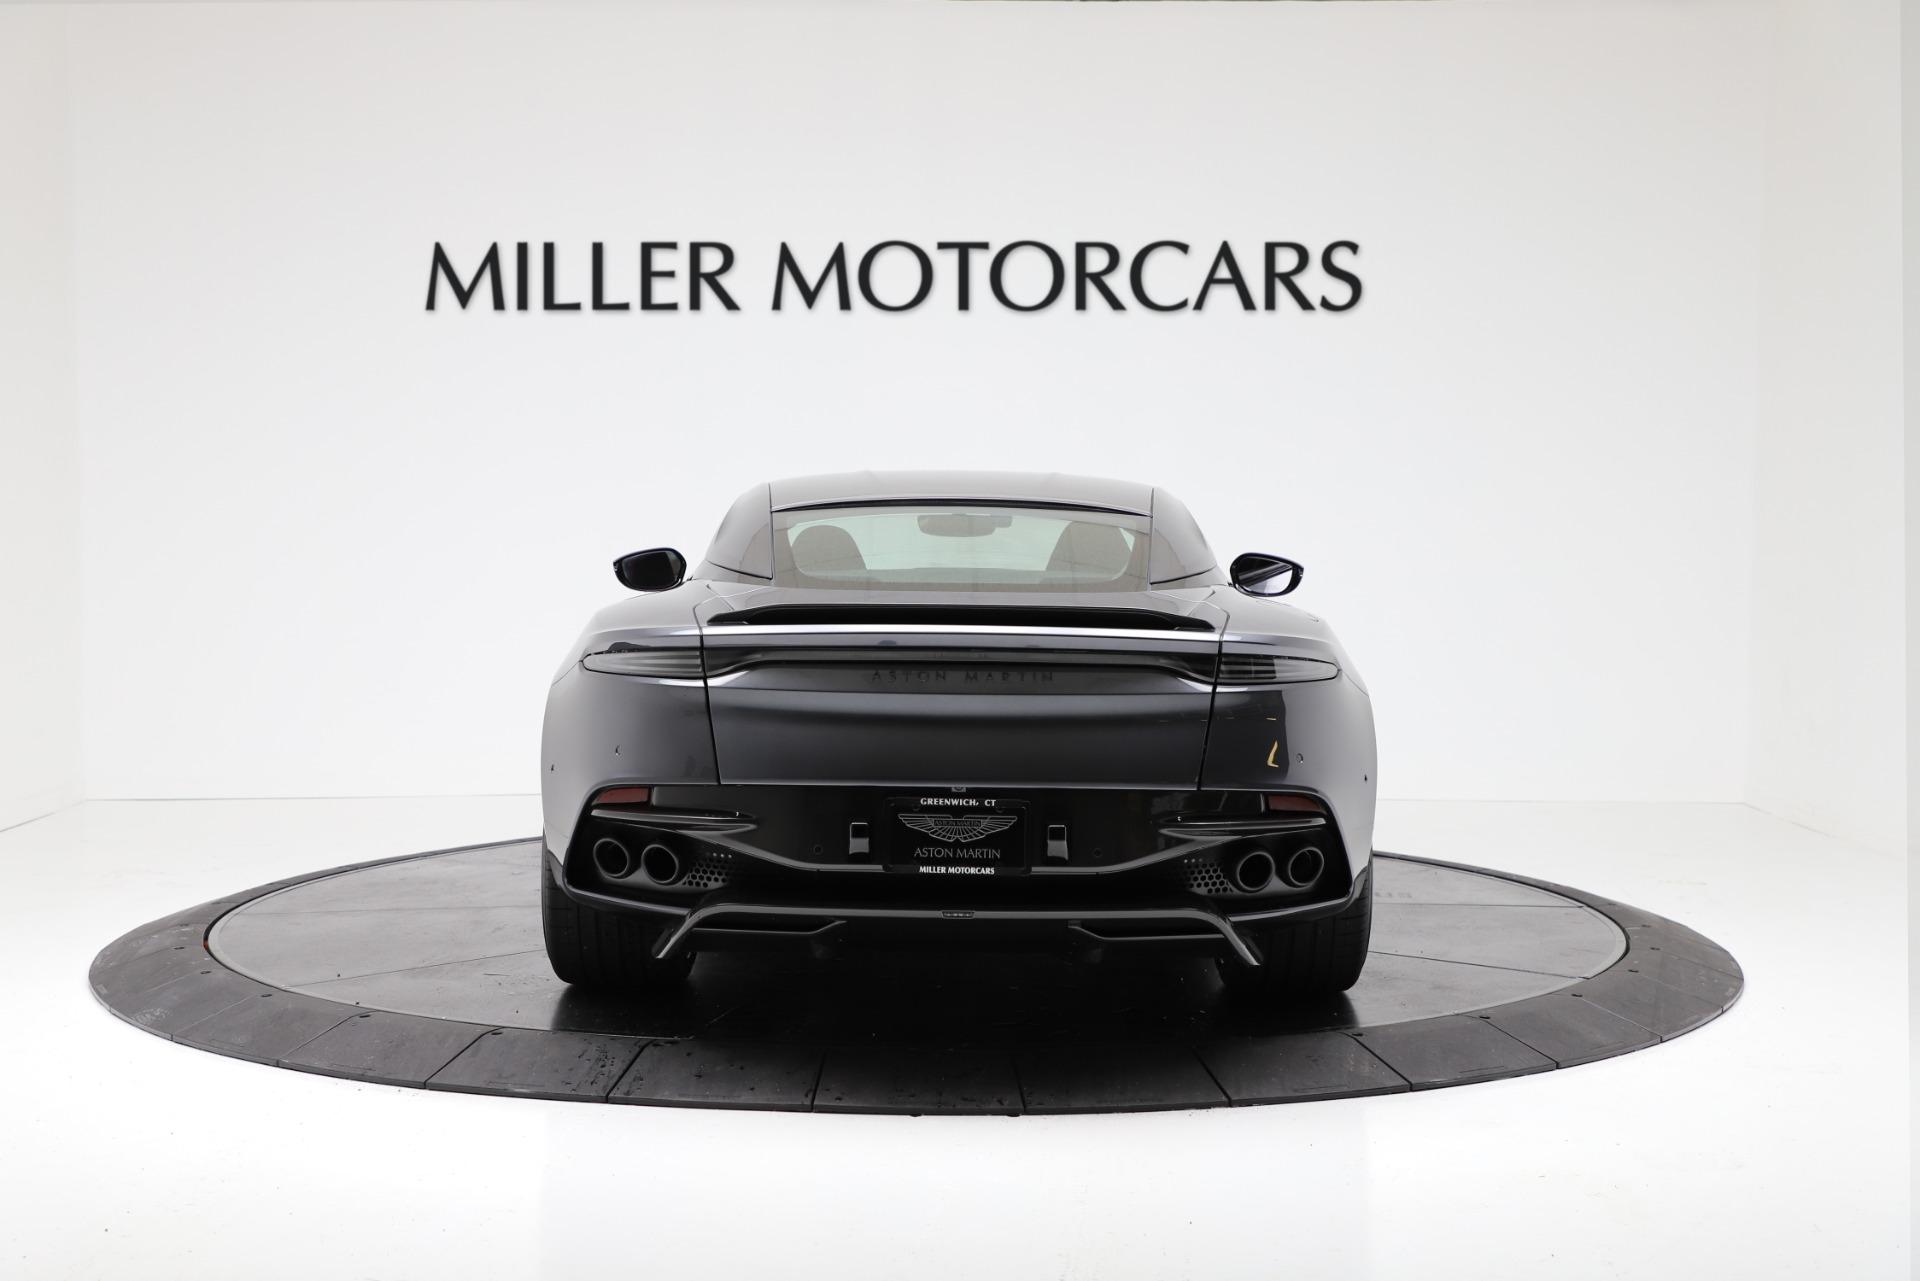 New 2019 Aston Martin DBS Superleggera For Sale In Greenwich, CT 3318_p5